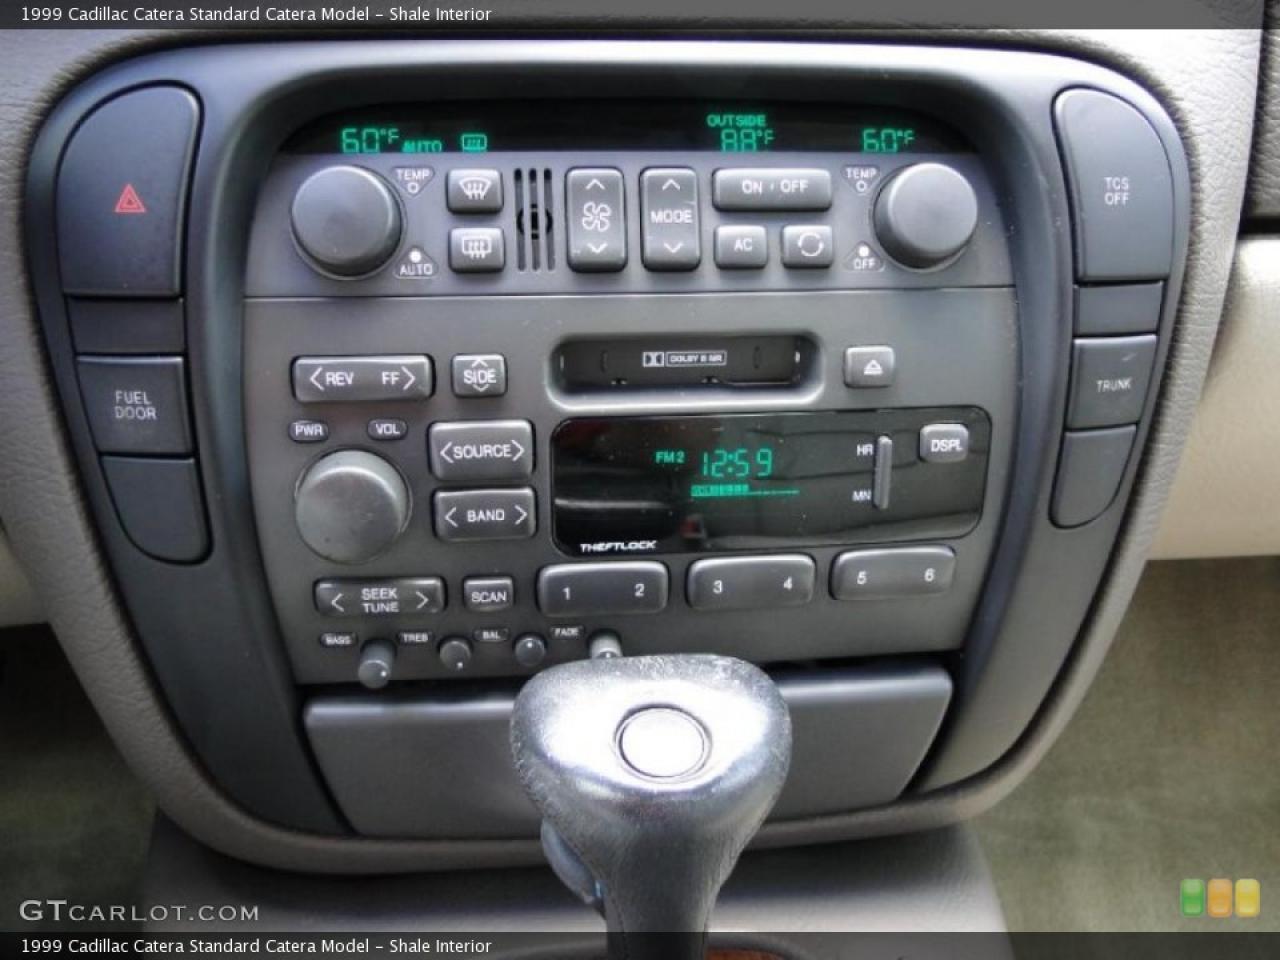 1999 Cadillac Catera 6 800 1024 1280 1600